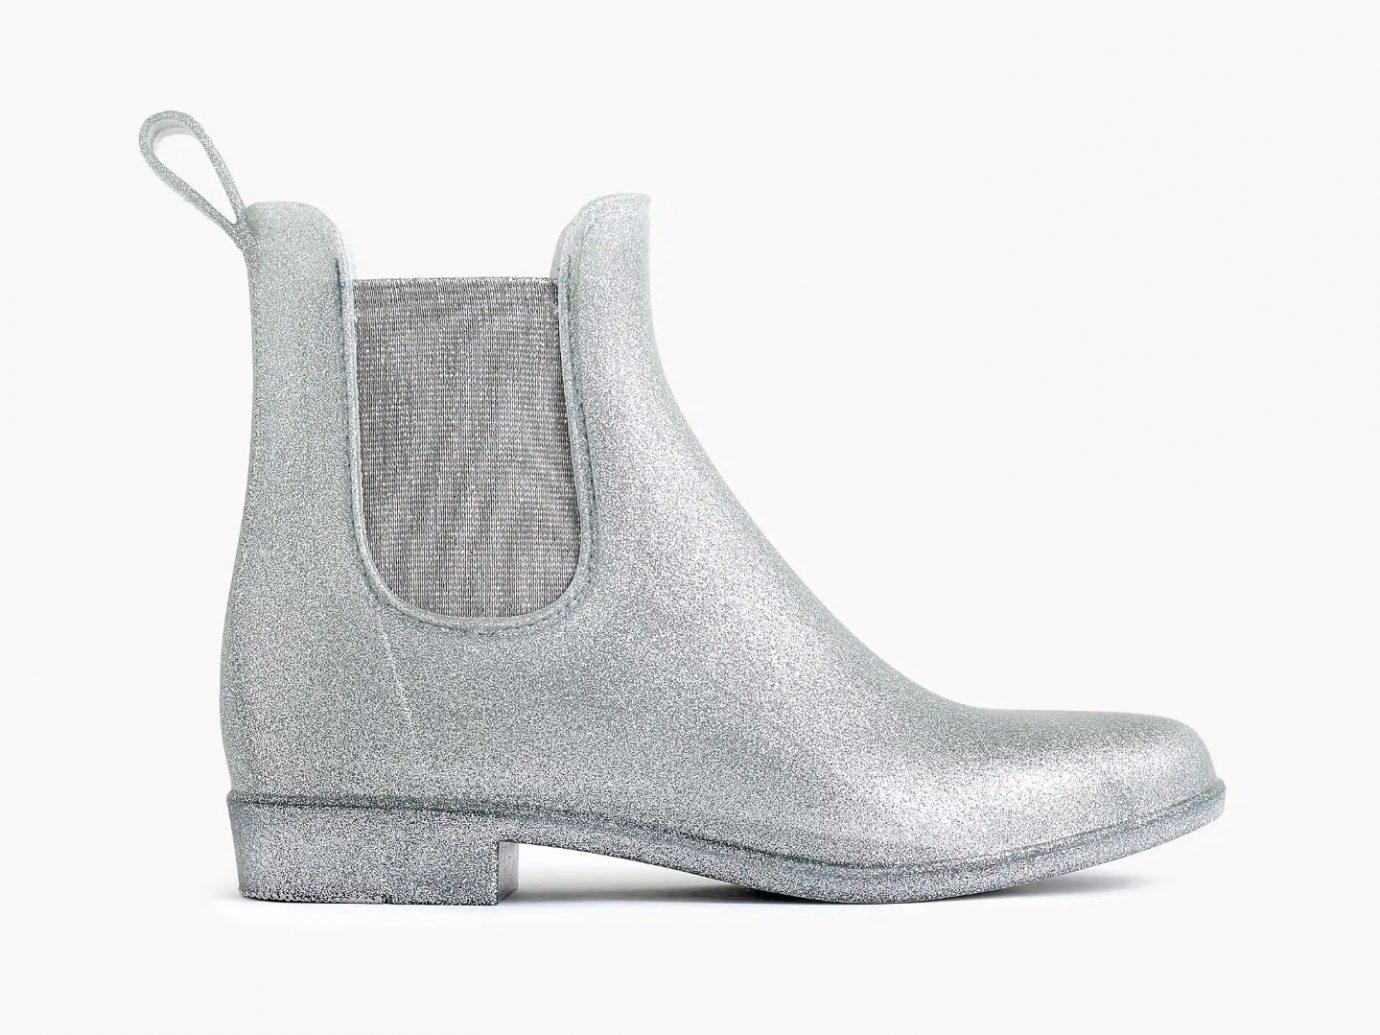 J.Crew Glitter Chelsea Rain Boots